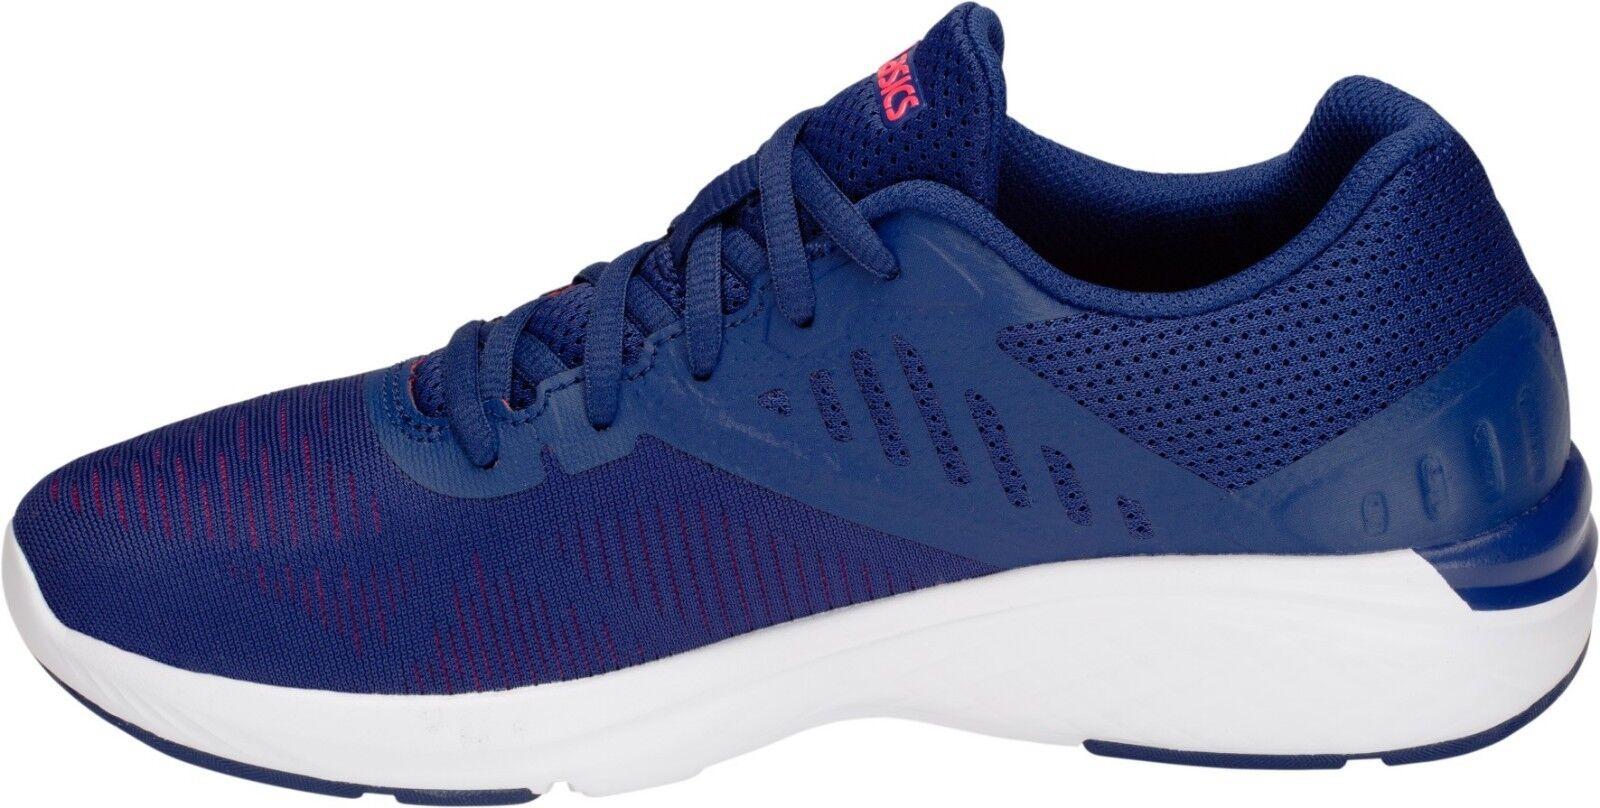 Brand New   Asics Gel Promesa donna Performance Running Running Running scarpe (B) (400) 6d9085